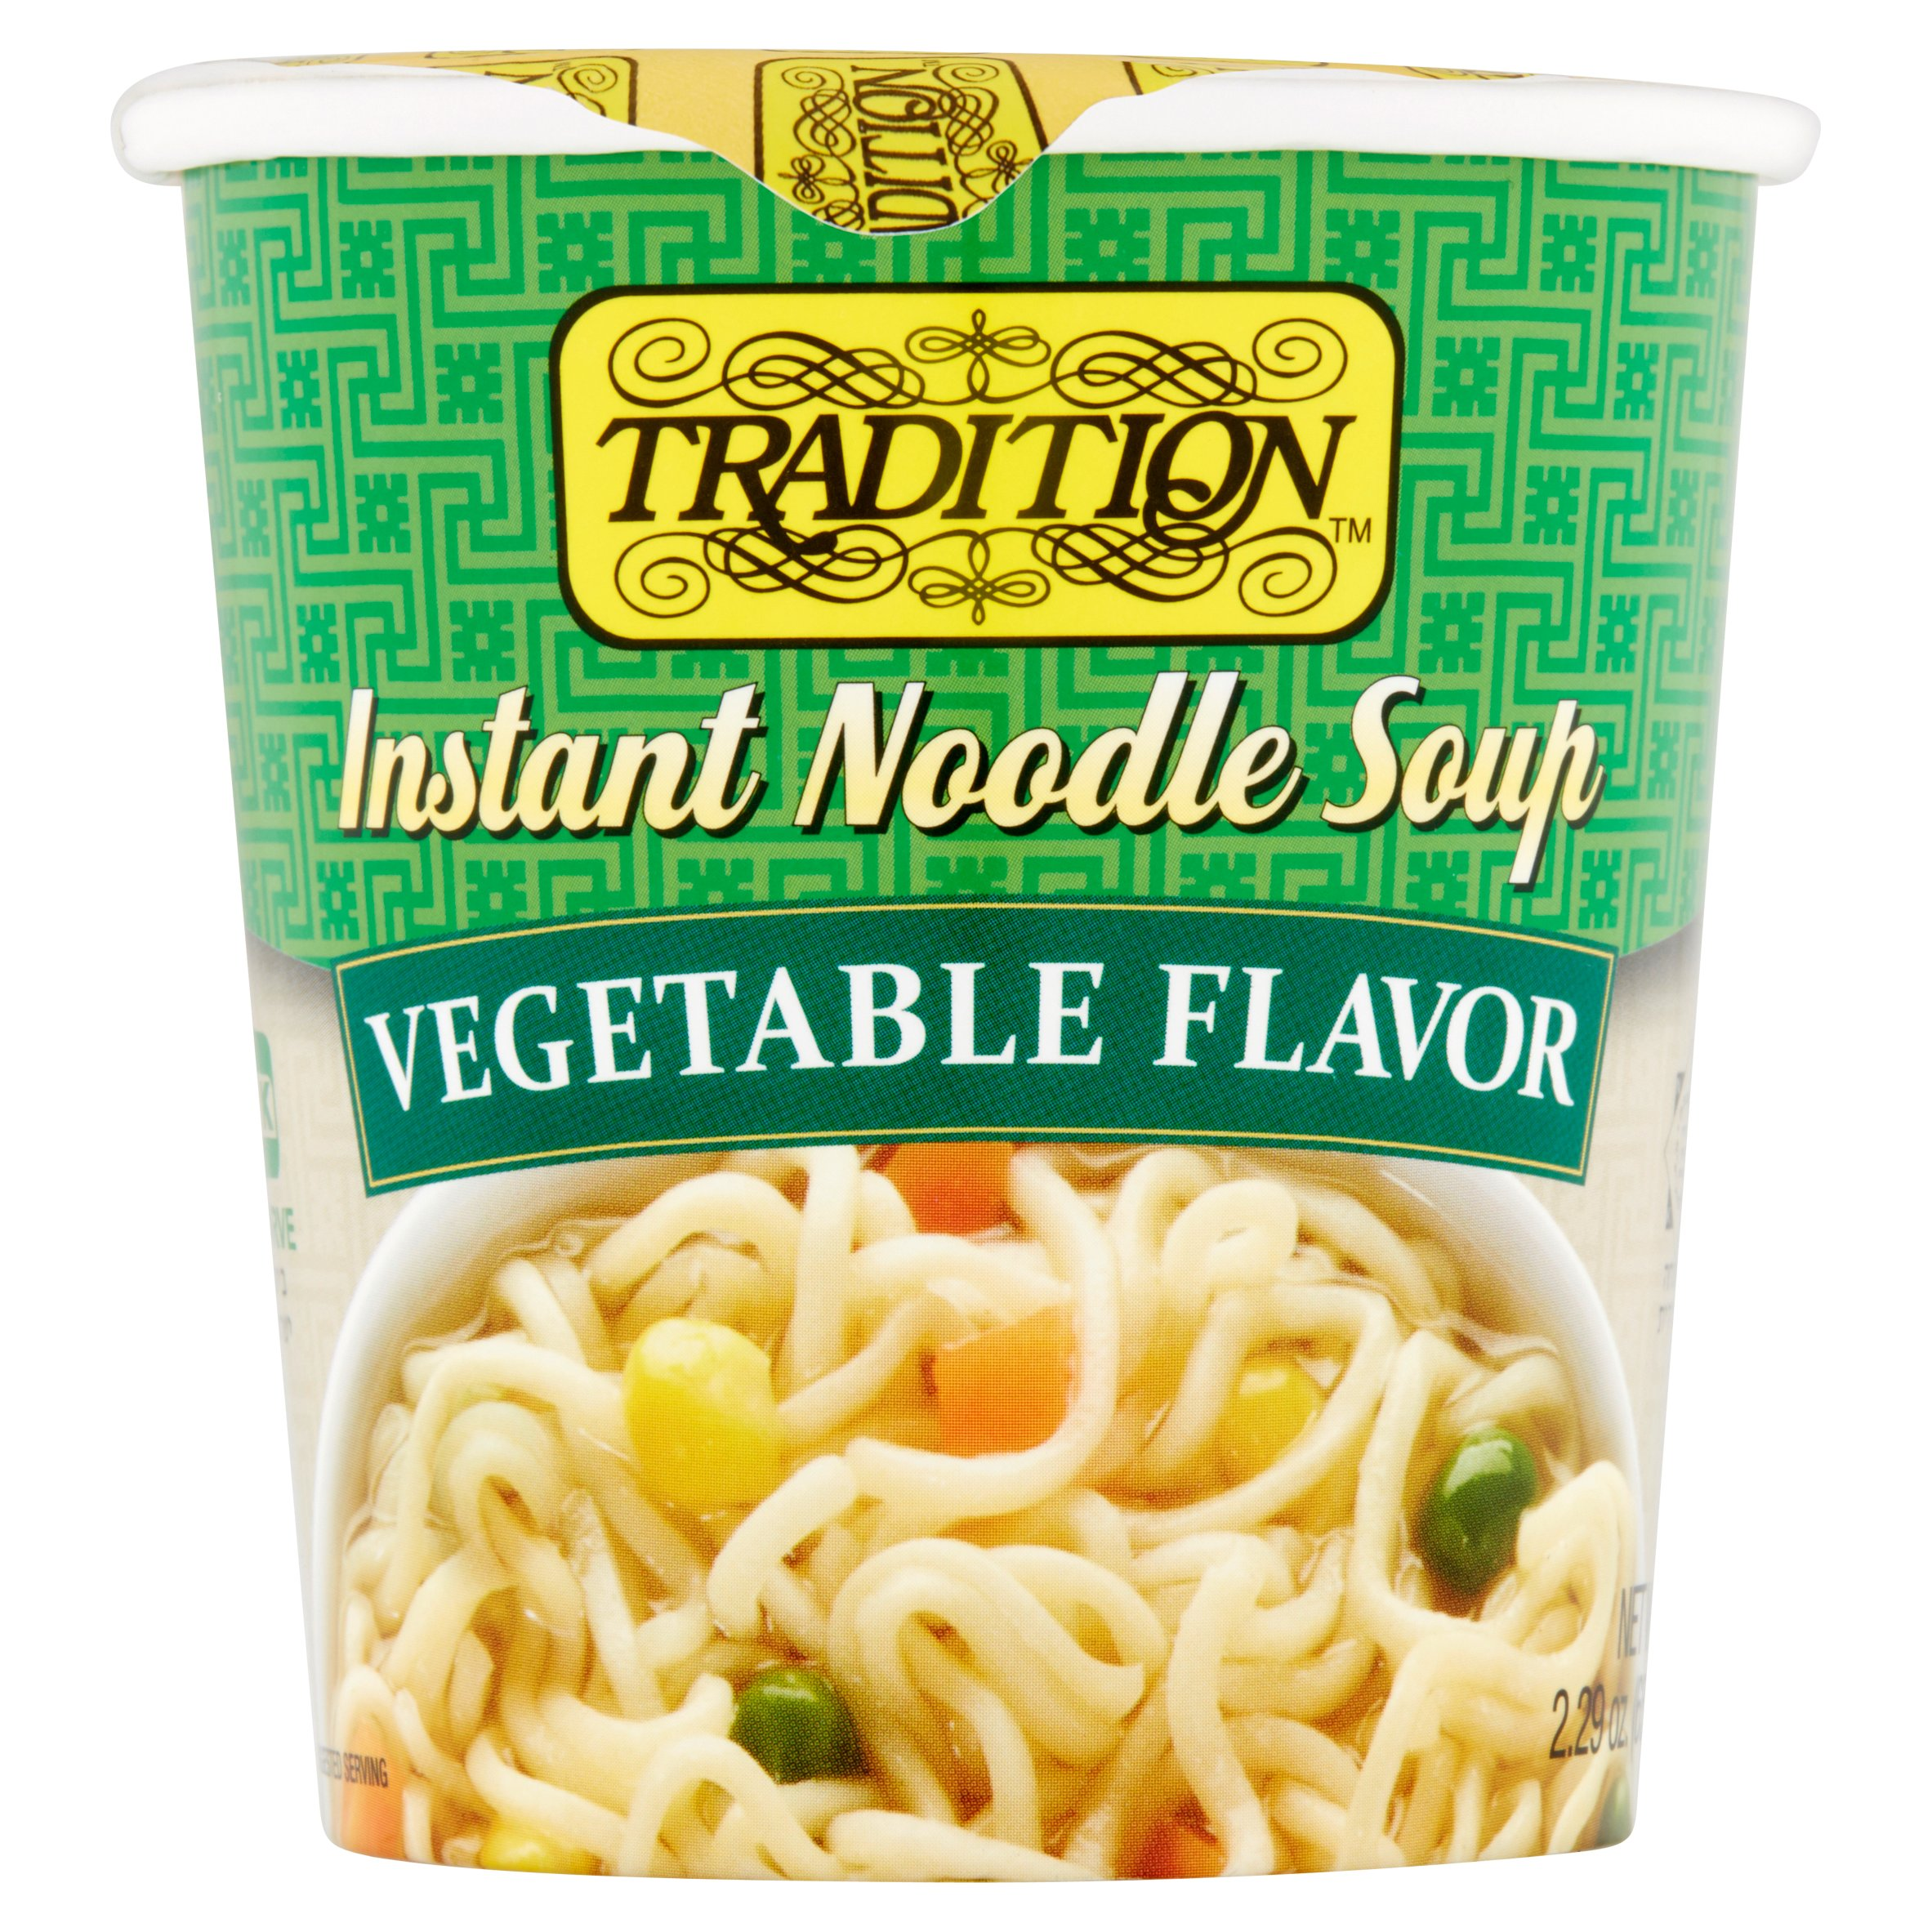 Fantastic World Foods Vegetable Flavor Instant Noodle Soup, 2.29 oz by Tradition Foods Inc.